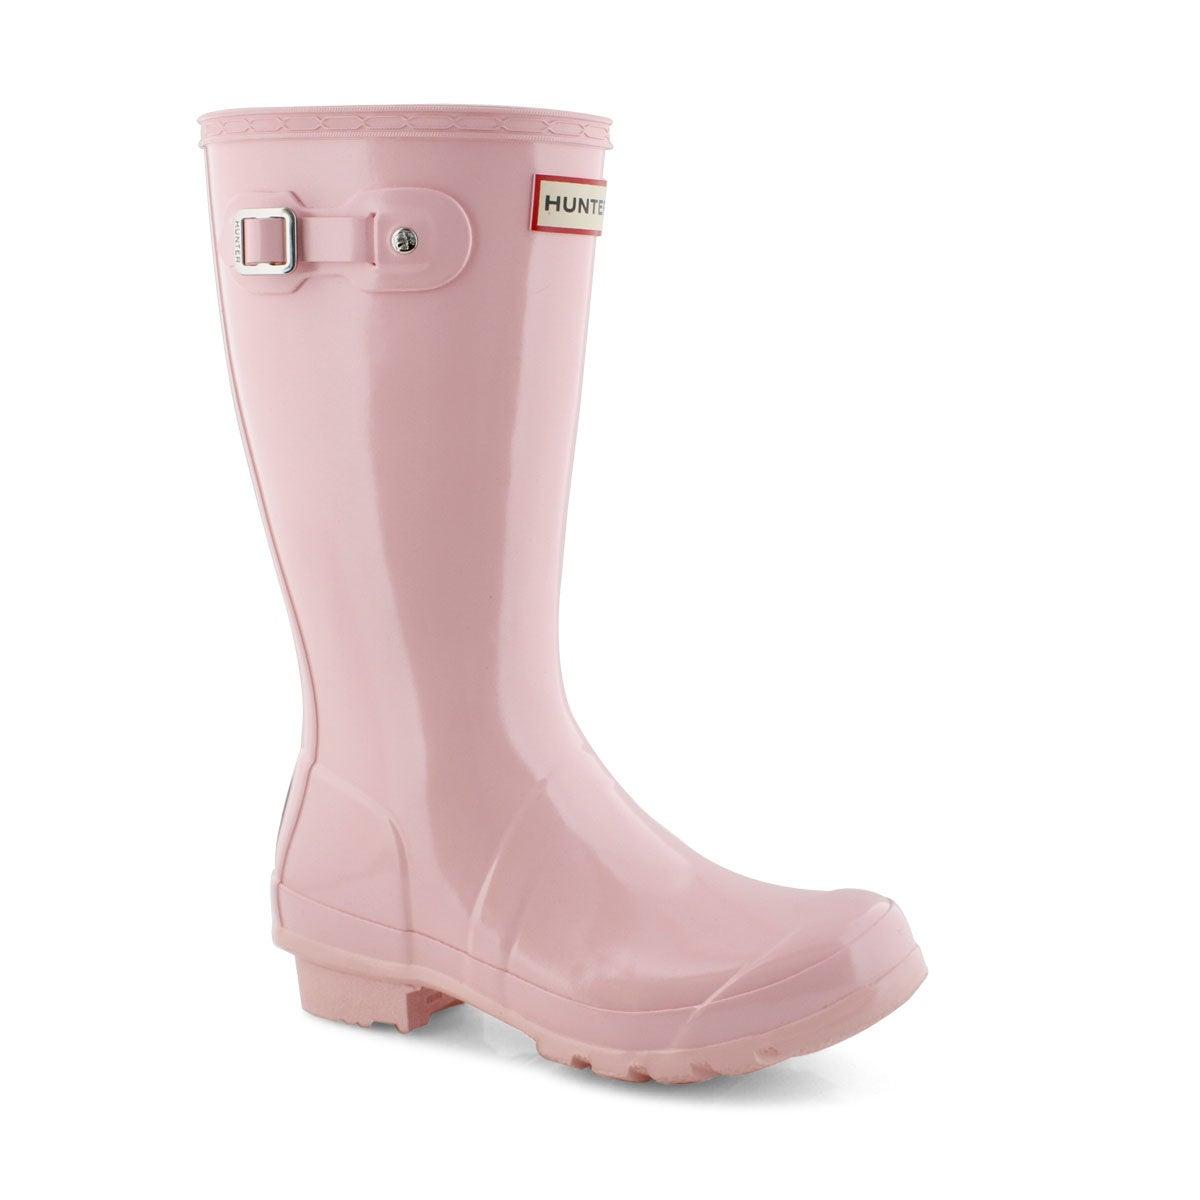 Grls Original Gloss pink rain boot